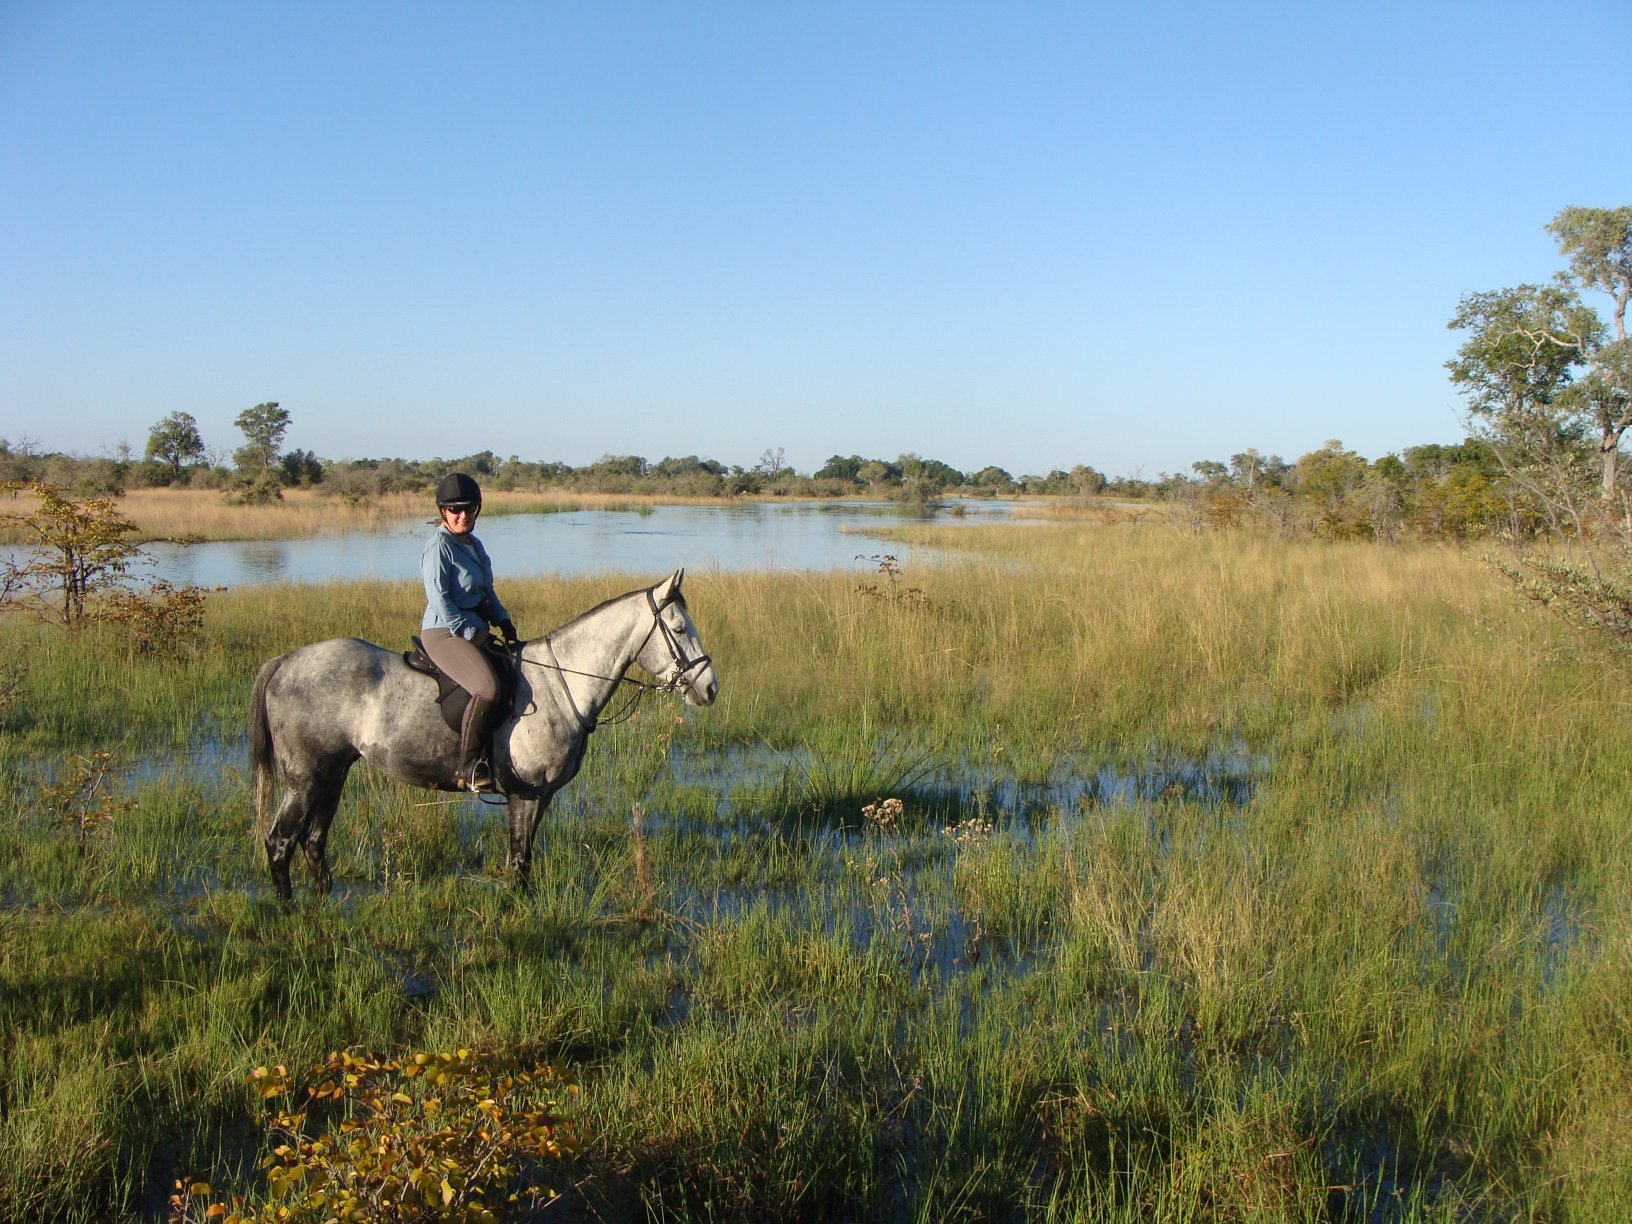 Cathy enjoying the spectacular scenery at Motswiri